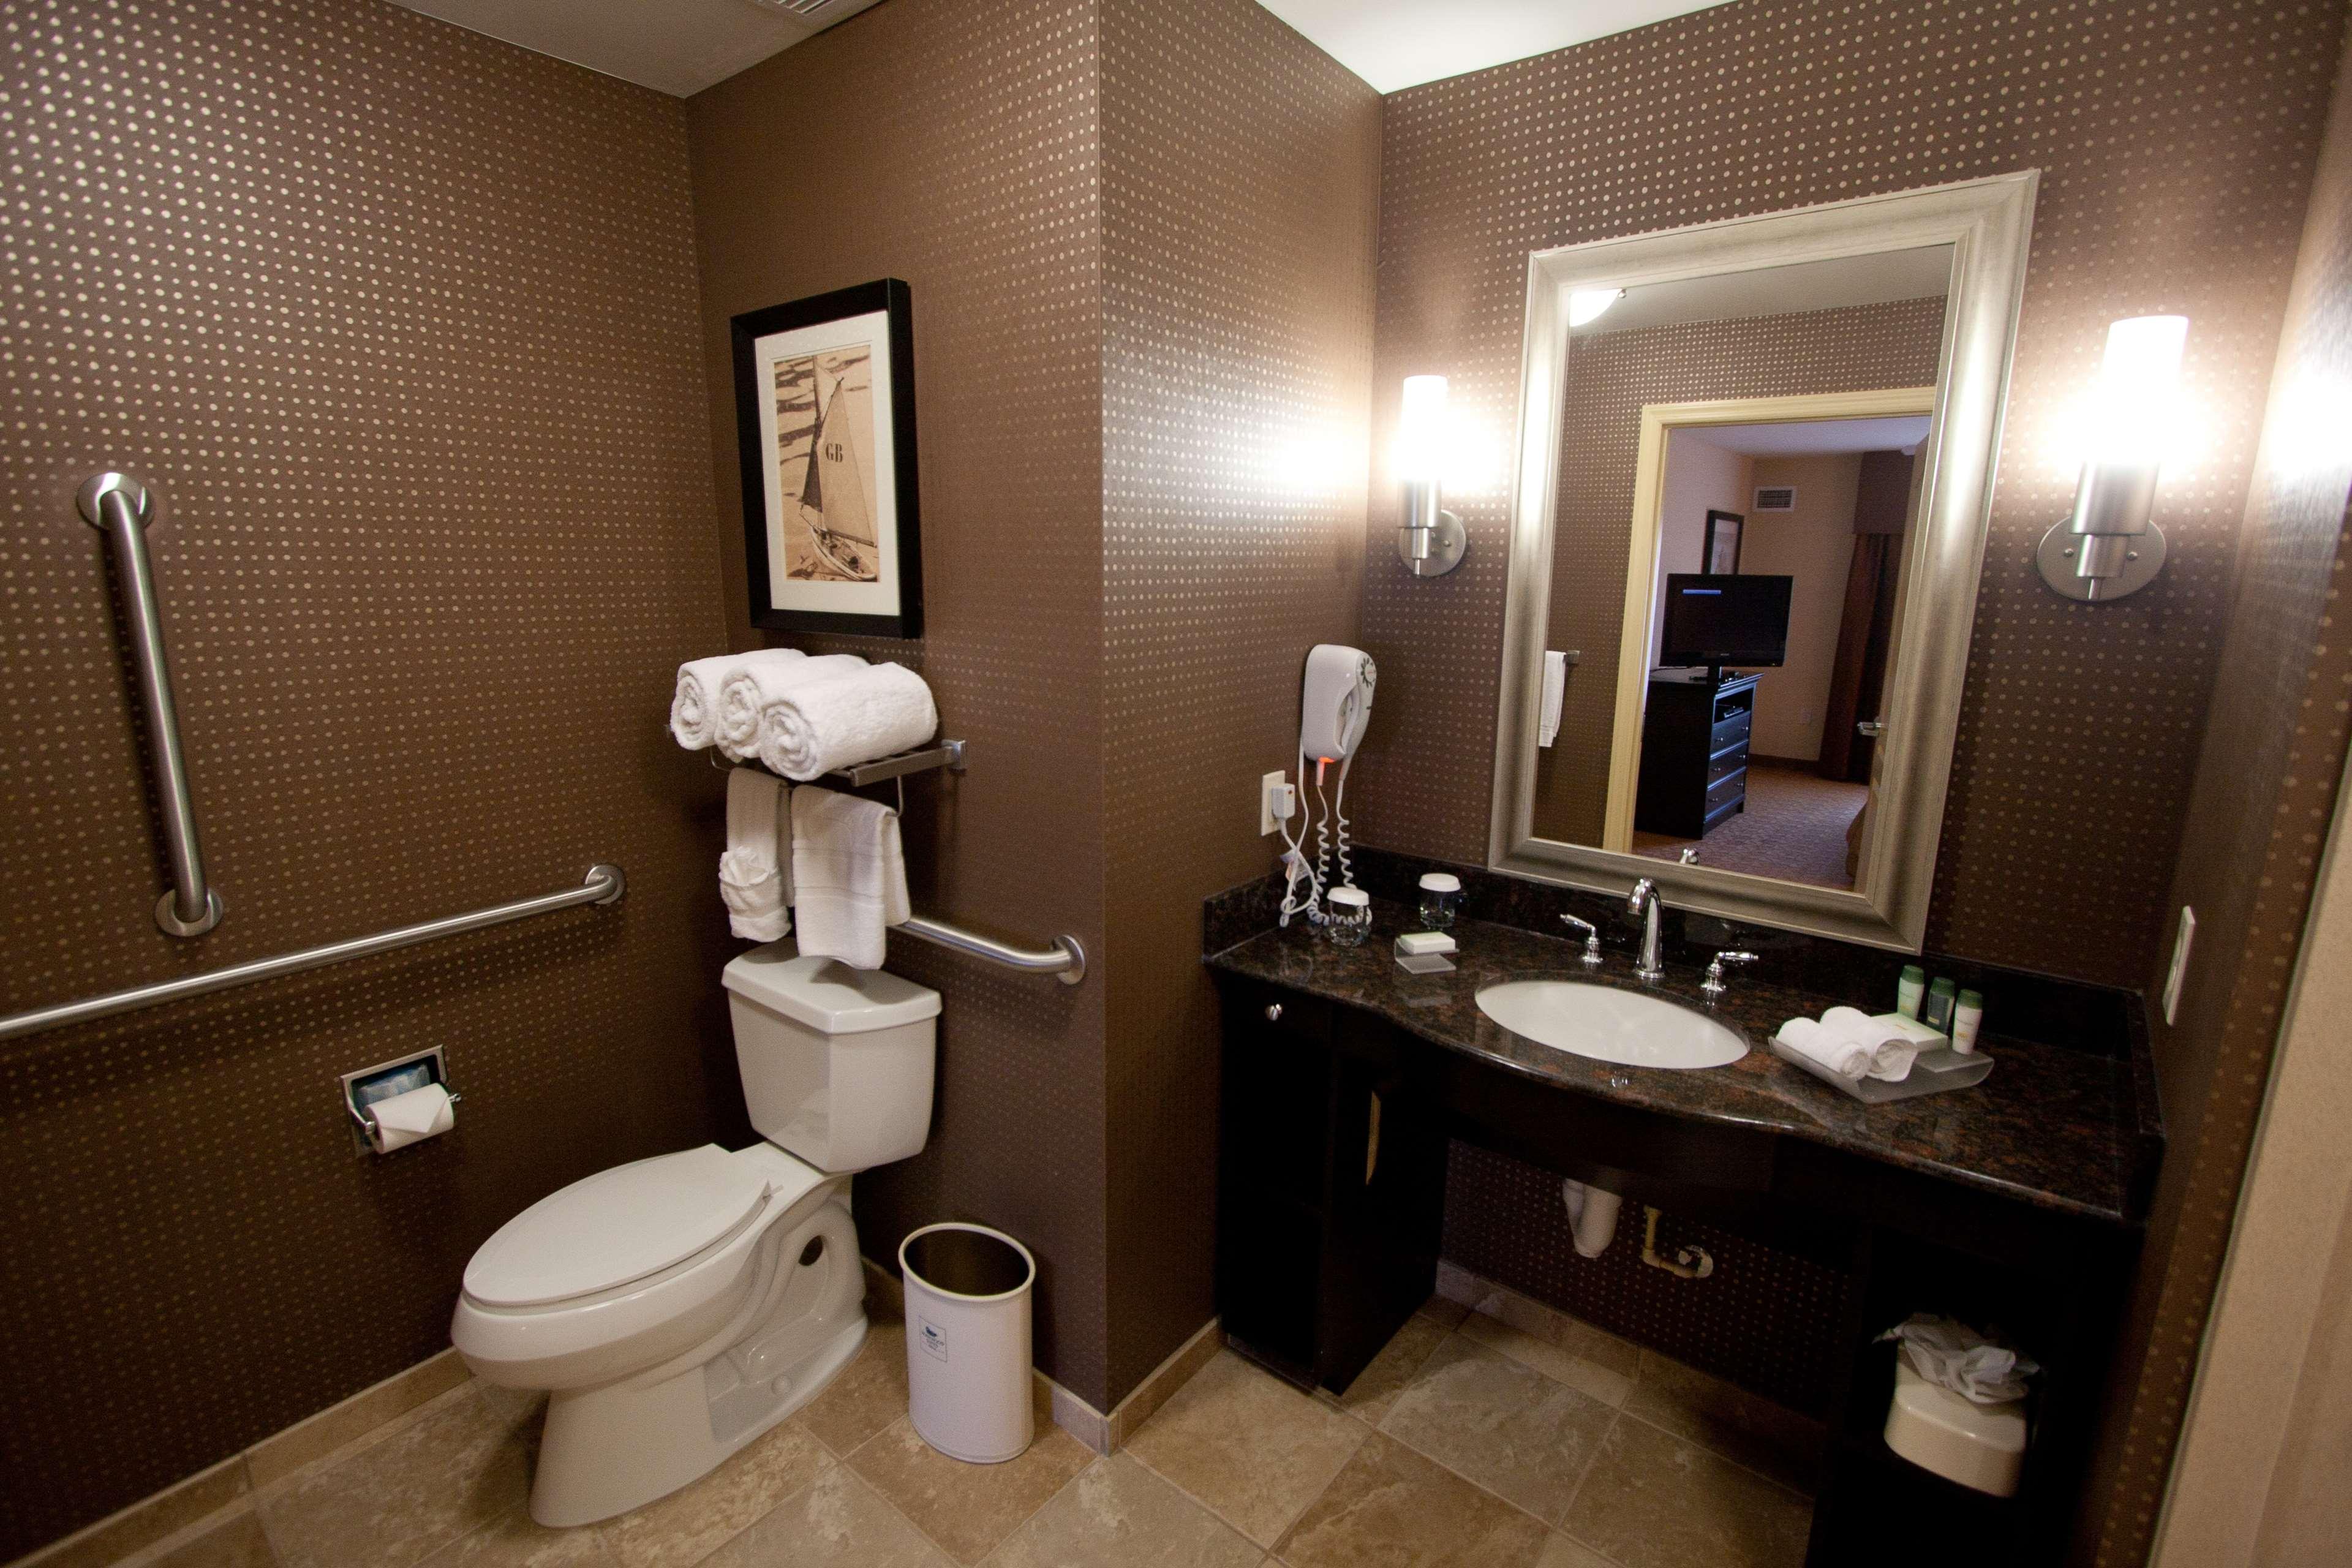 Homewood Suites by Hilton Cincinnati Airport South-Florence image 15